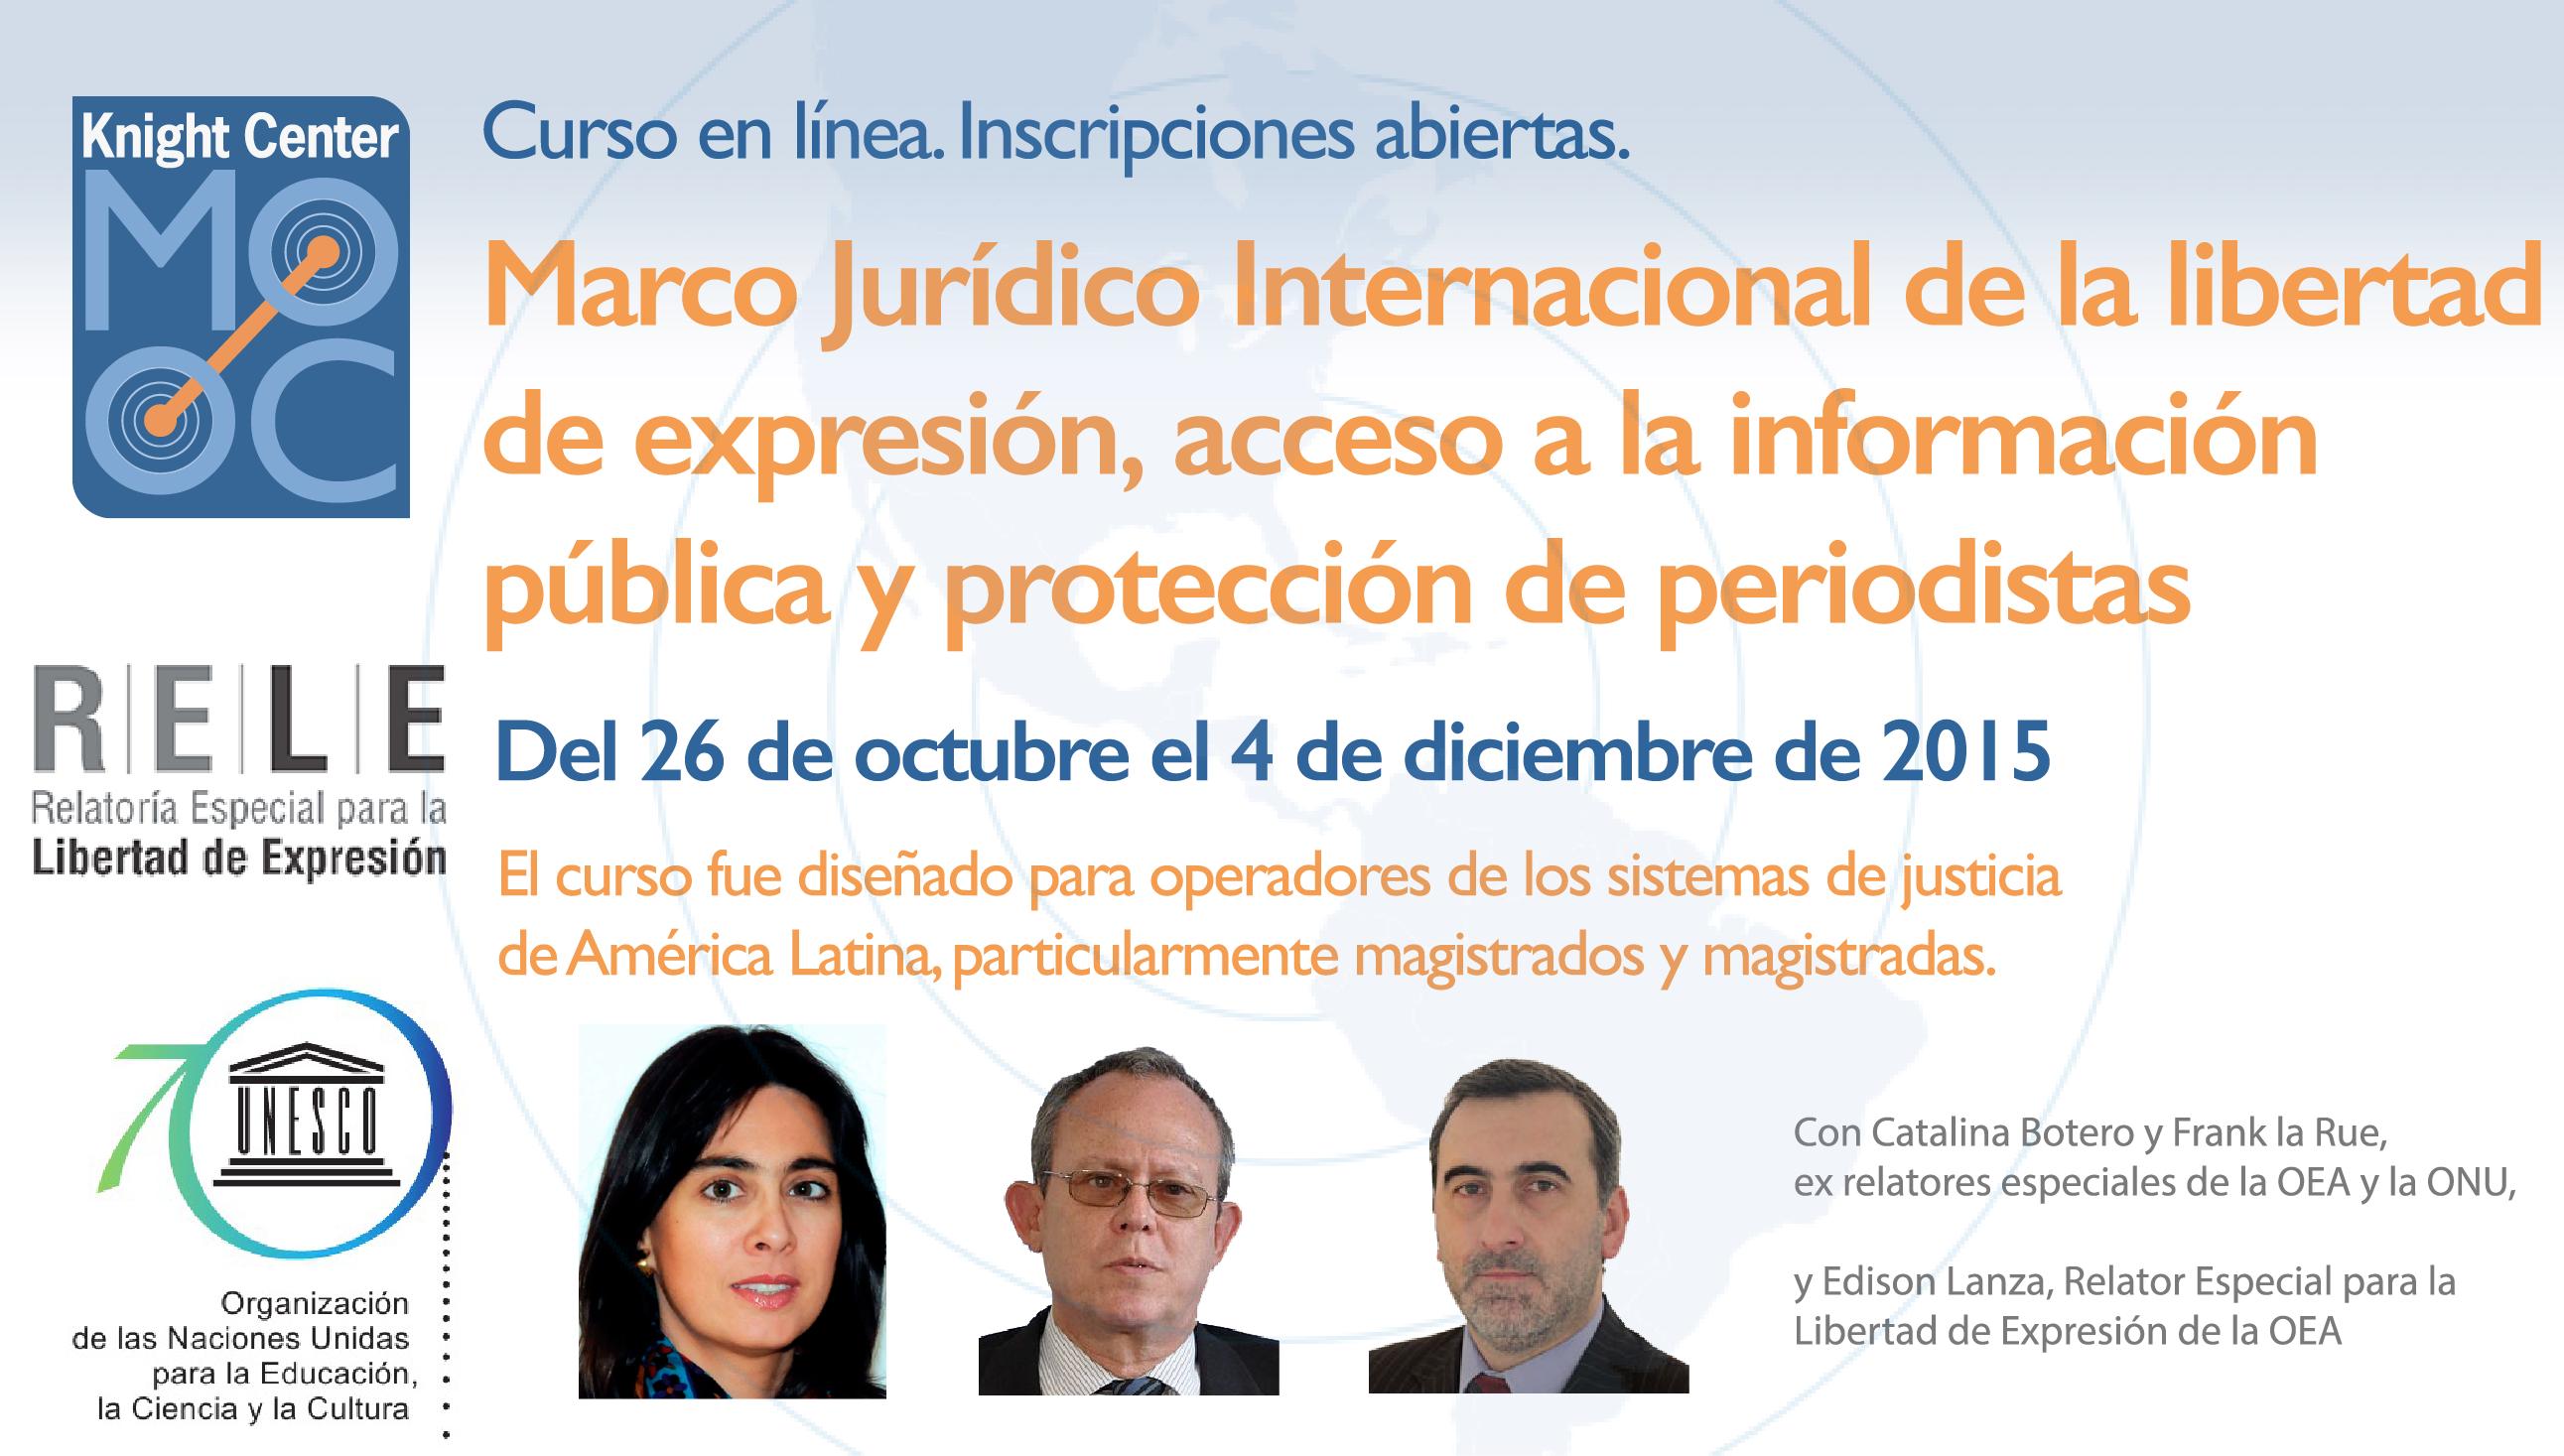 International Legal Framework on Freedom of Expression